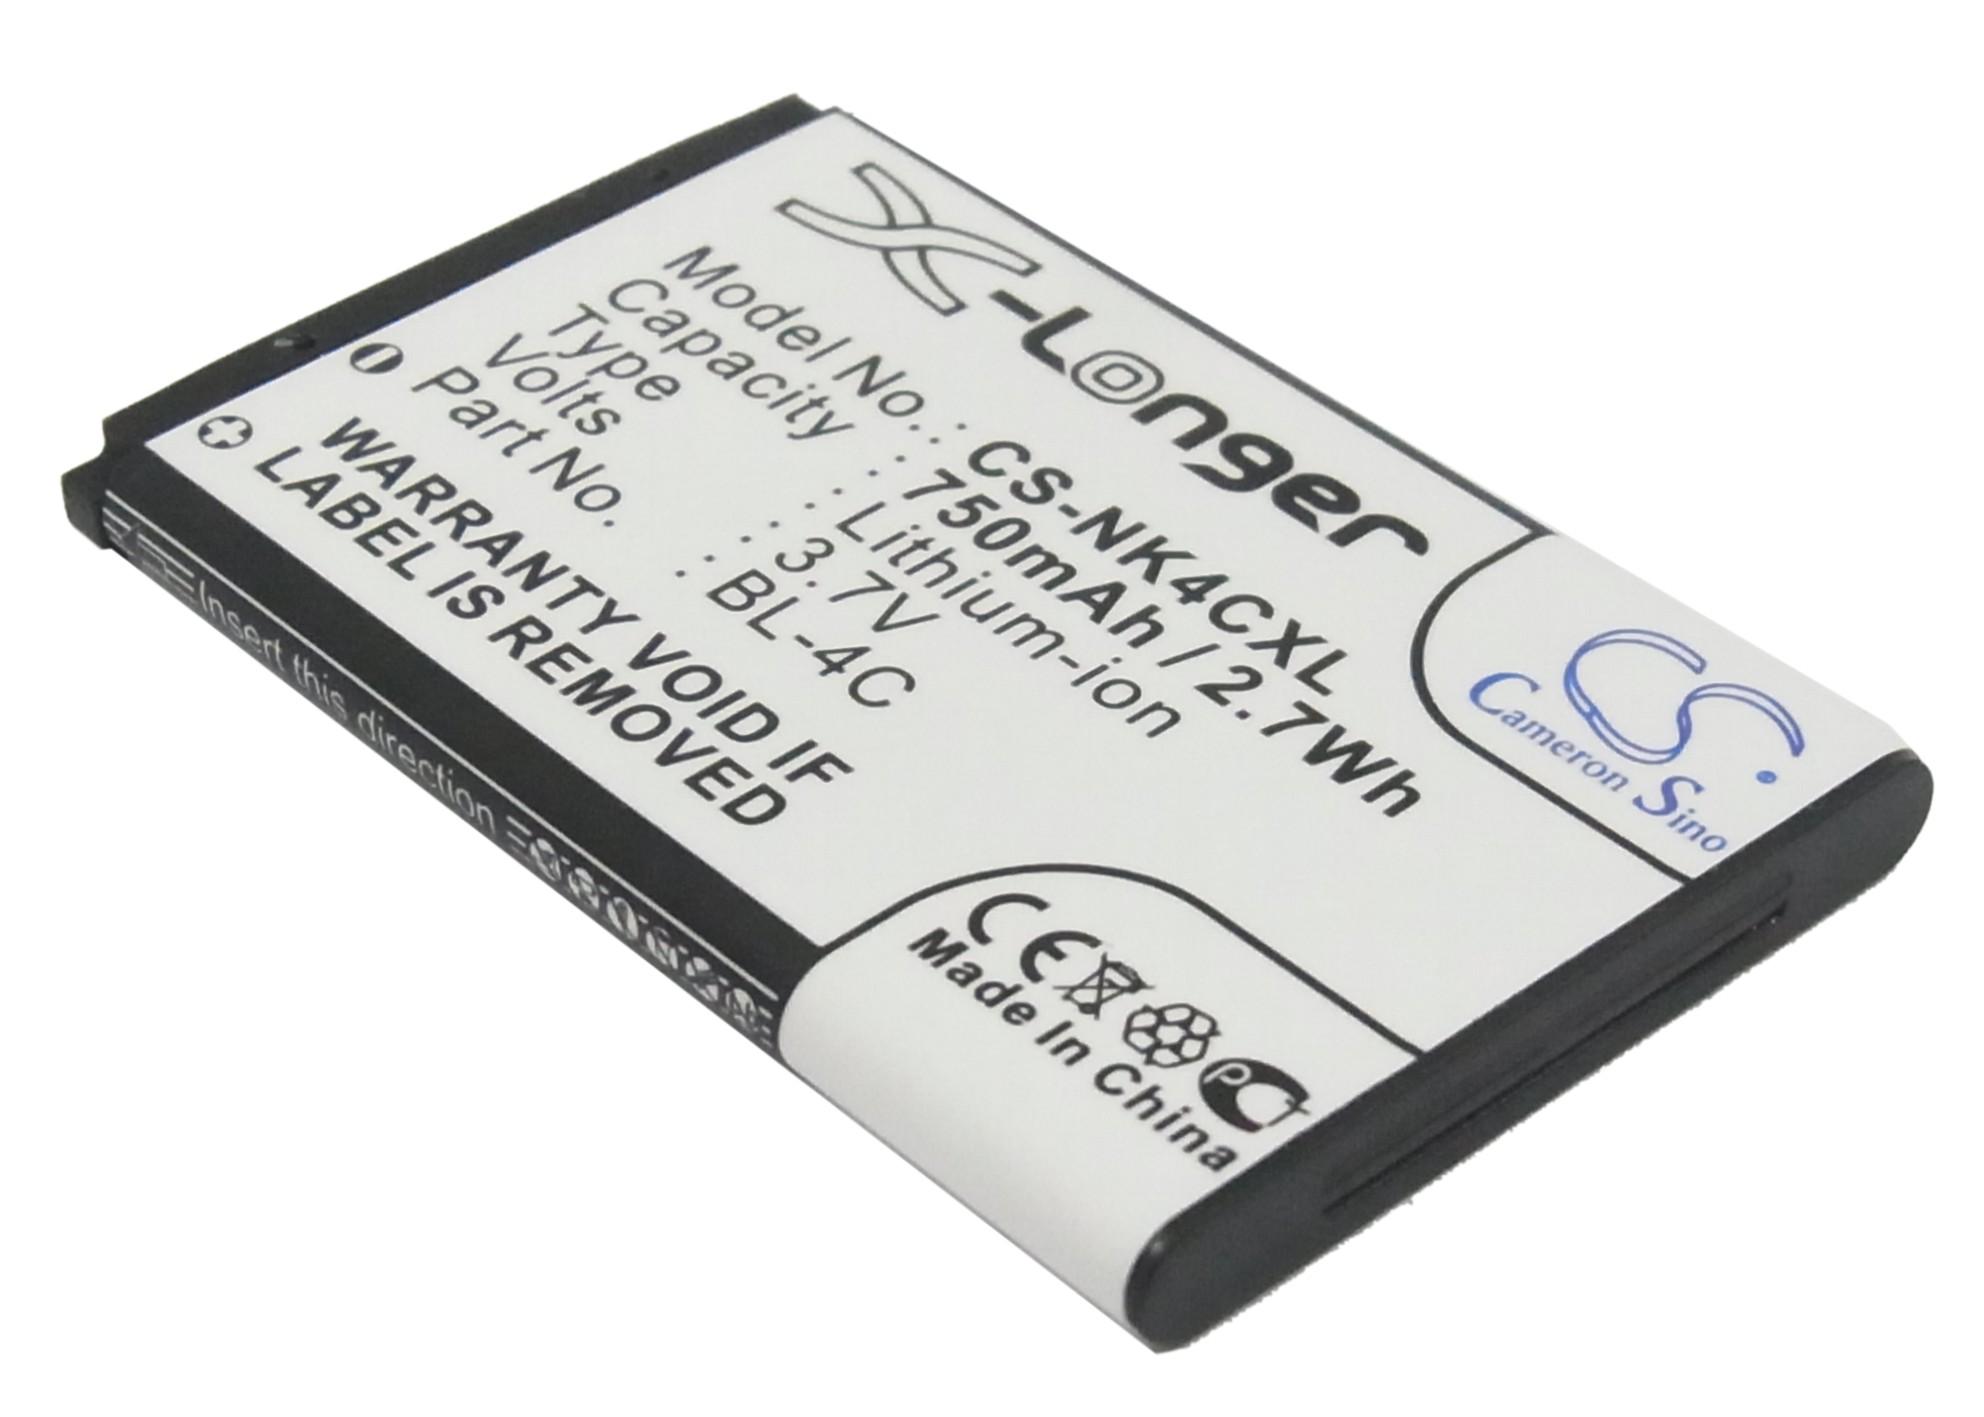 Cameron Sino baterie do mobilů pro NOKIA 6300 3.7V Li-ion 750mAh černá - neoriginální